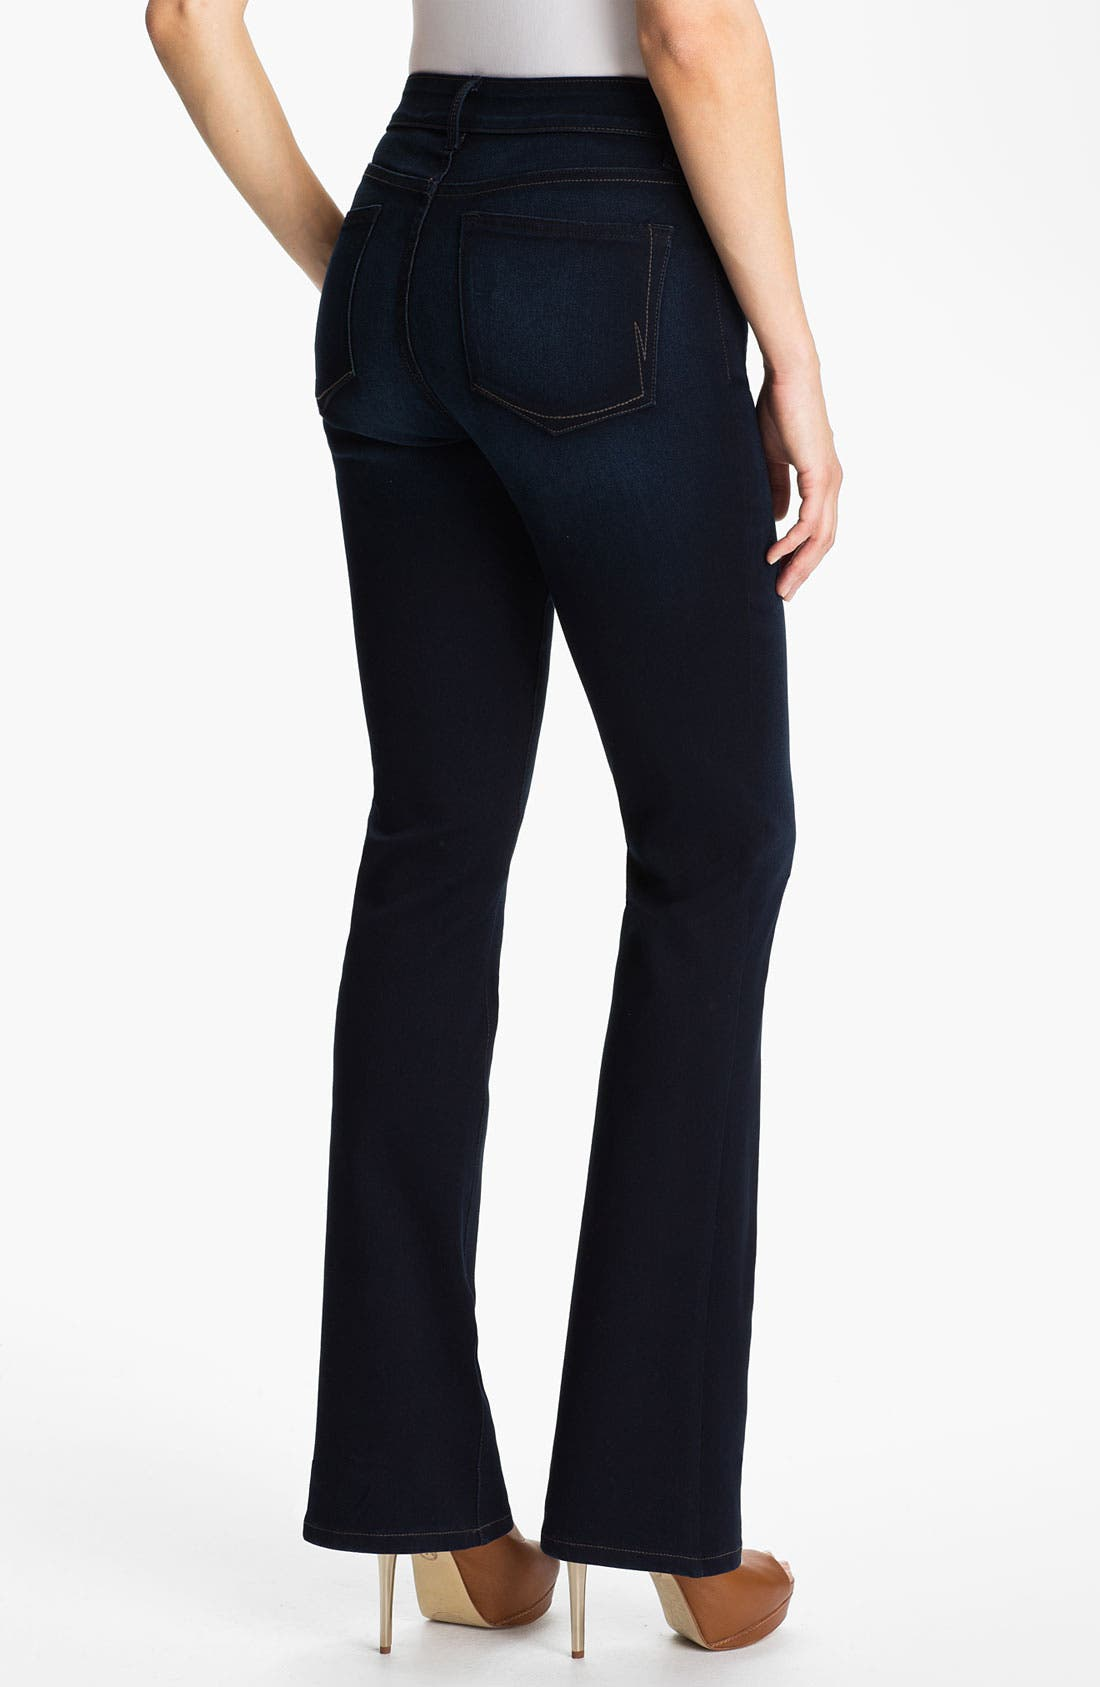 Alternate Image 2  - NYDJ 'Barbara' Bootcut Jeans (Long)